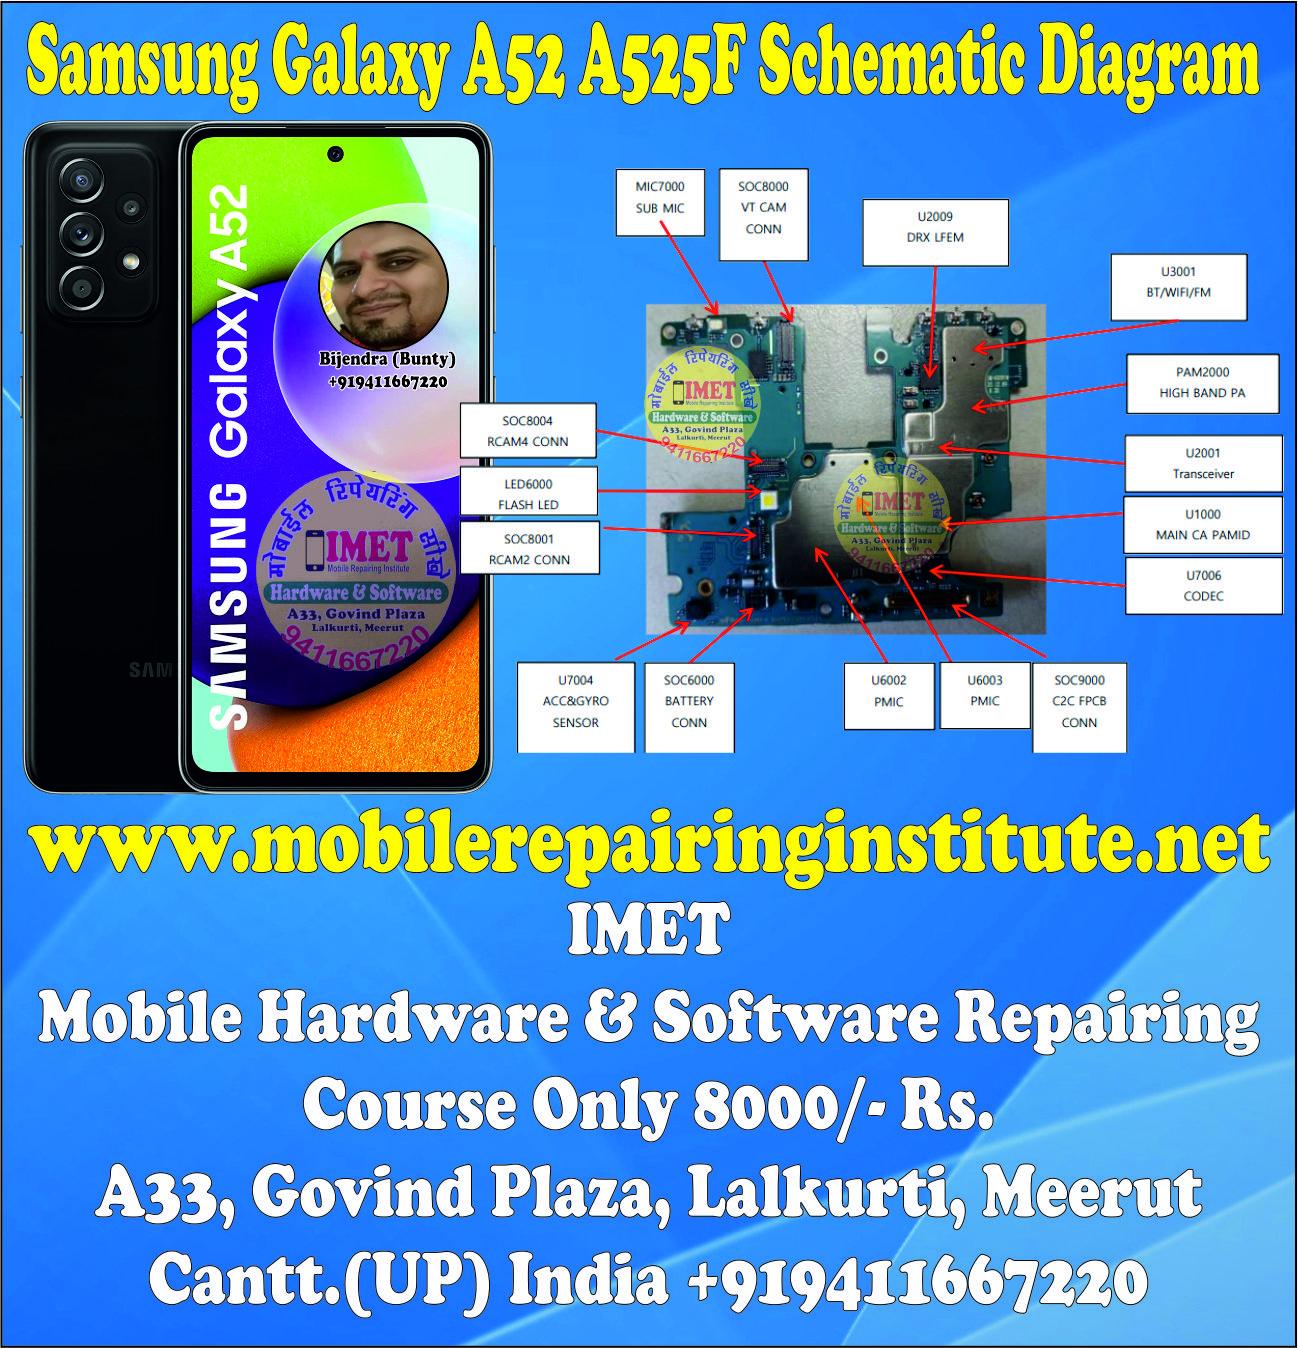 Samsung Galaxy A52 A525F Schematic Diagram – Service Manual Download